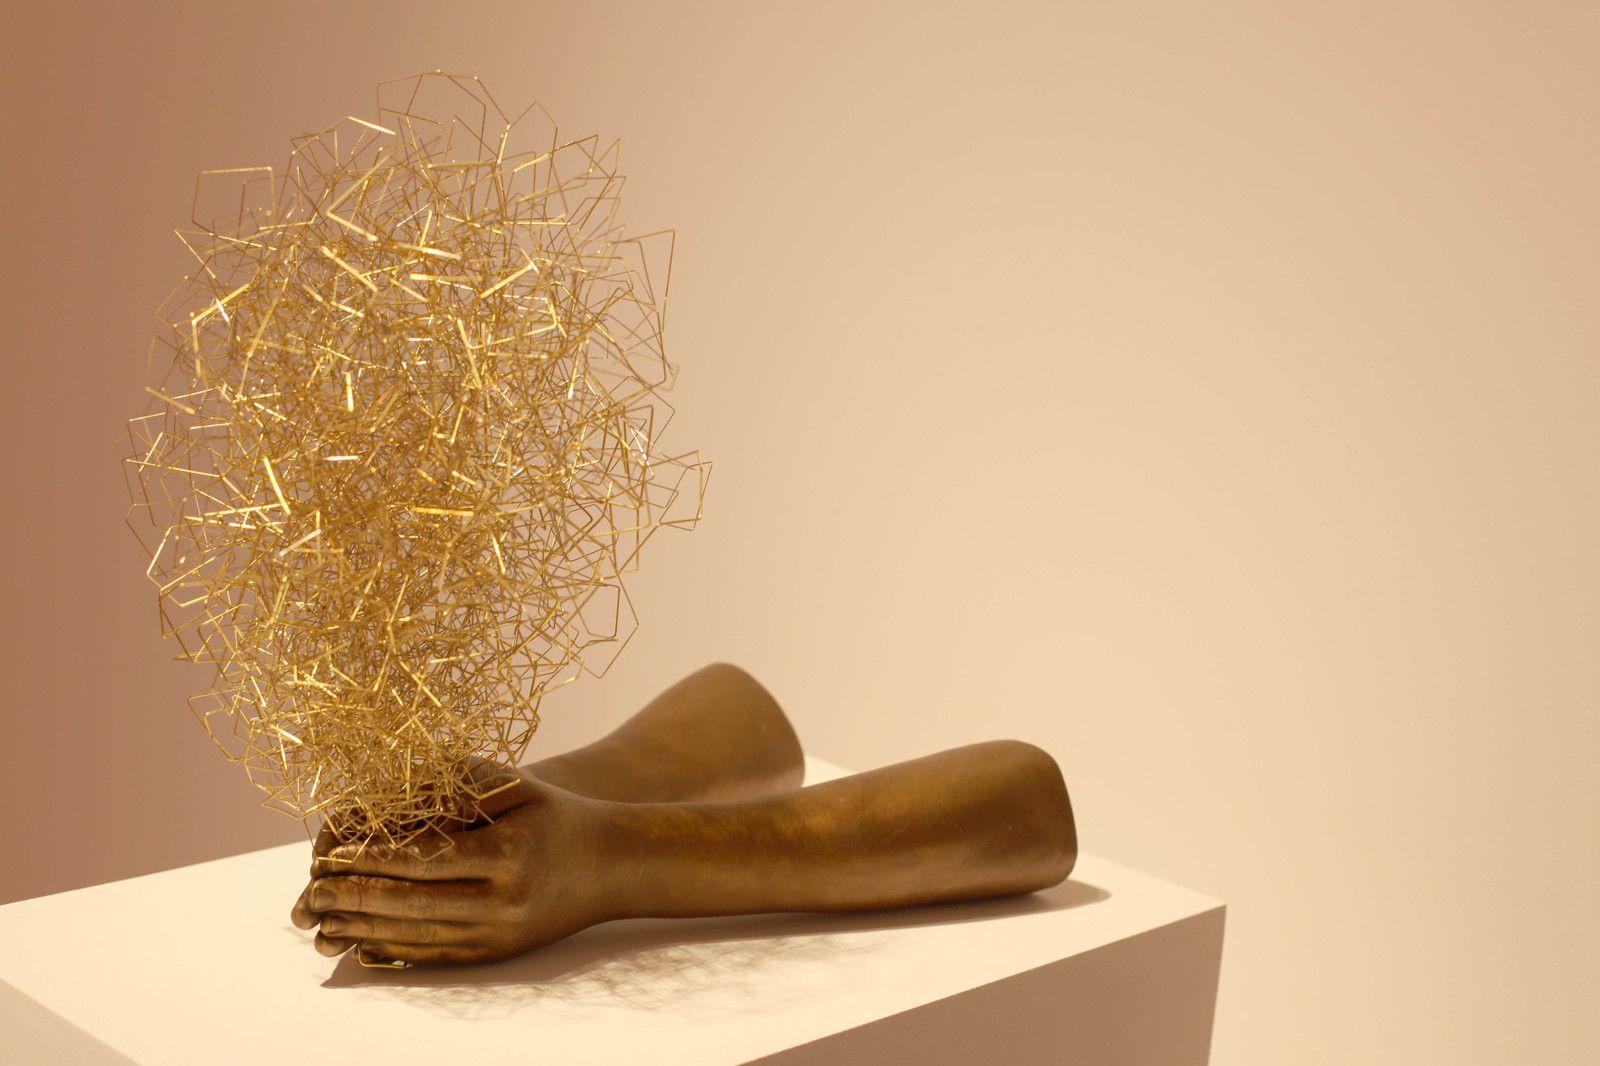 """In the Hand"", 2020 de Chiharu SHIOTA - Courtesy Galerie Templon Paris © Photo Éric Simon"